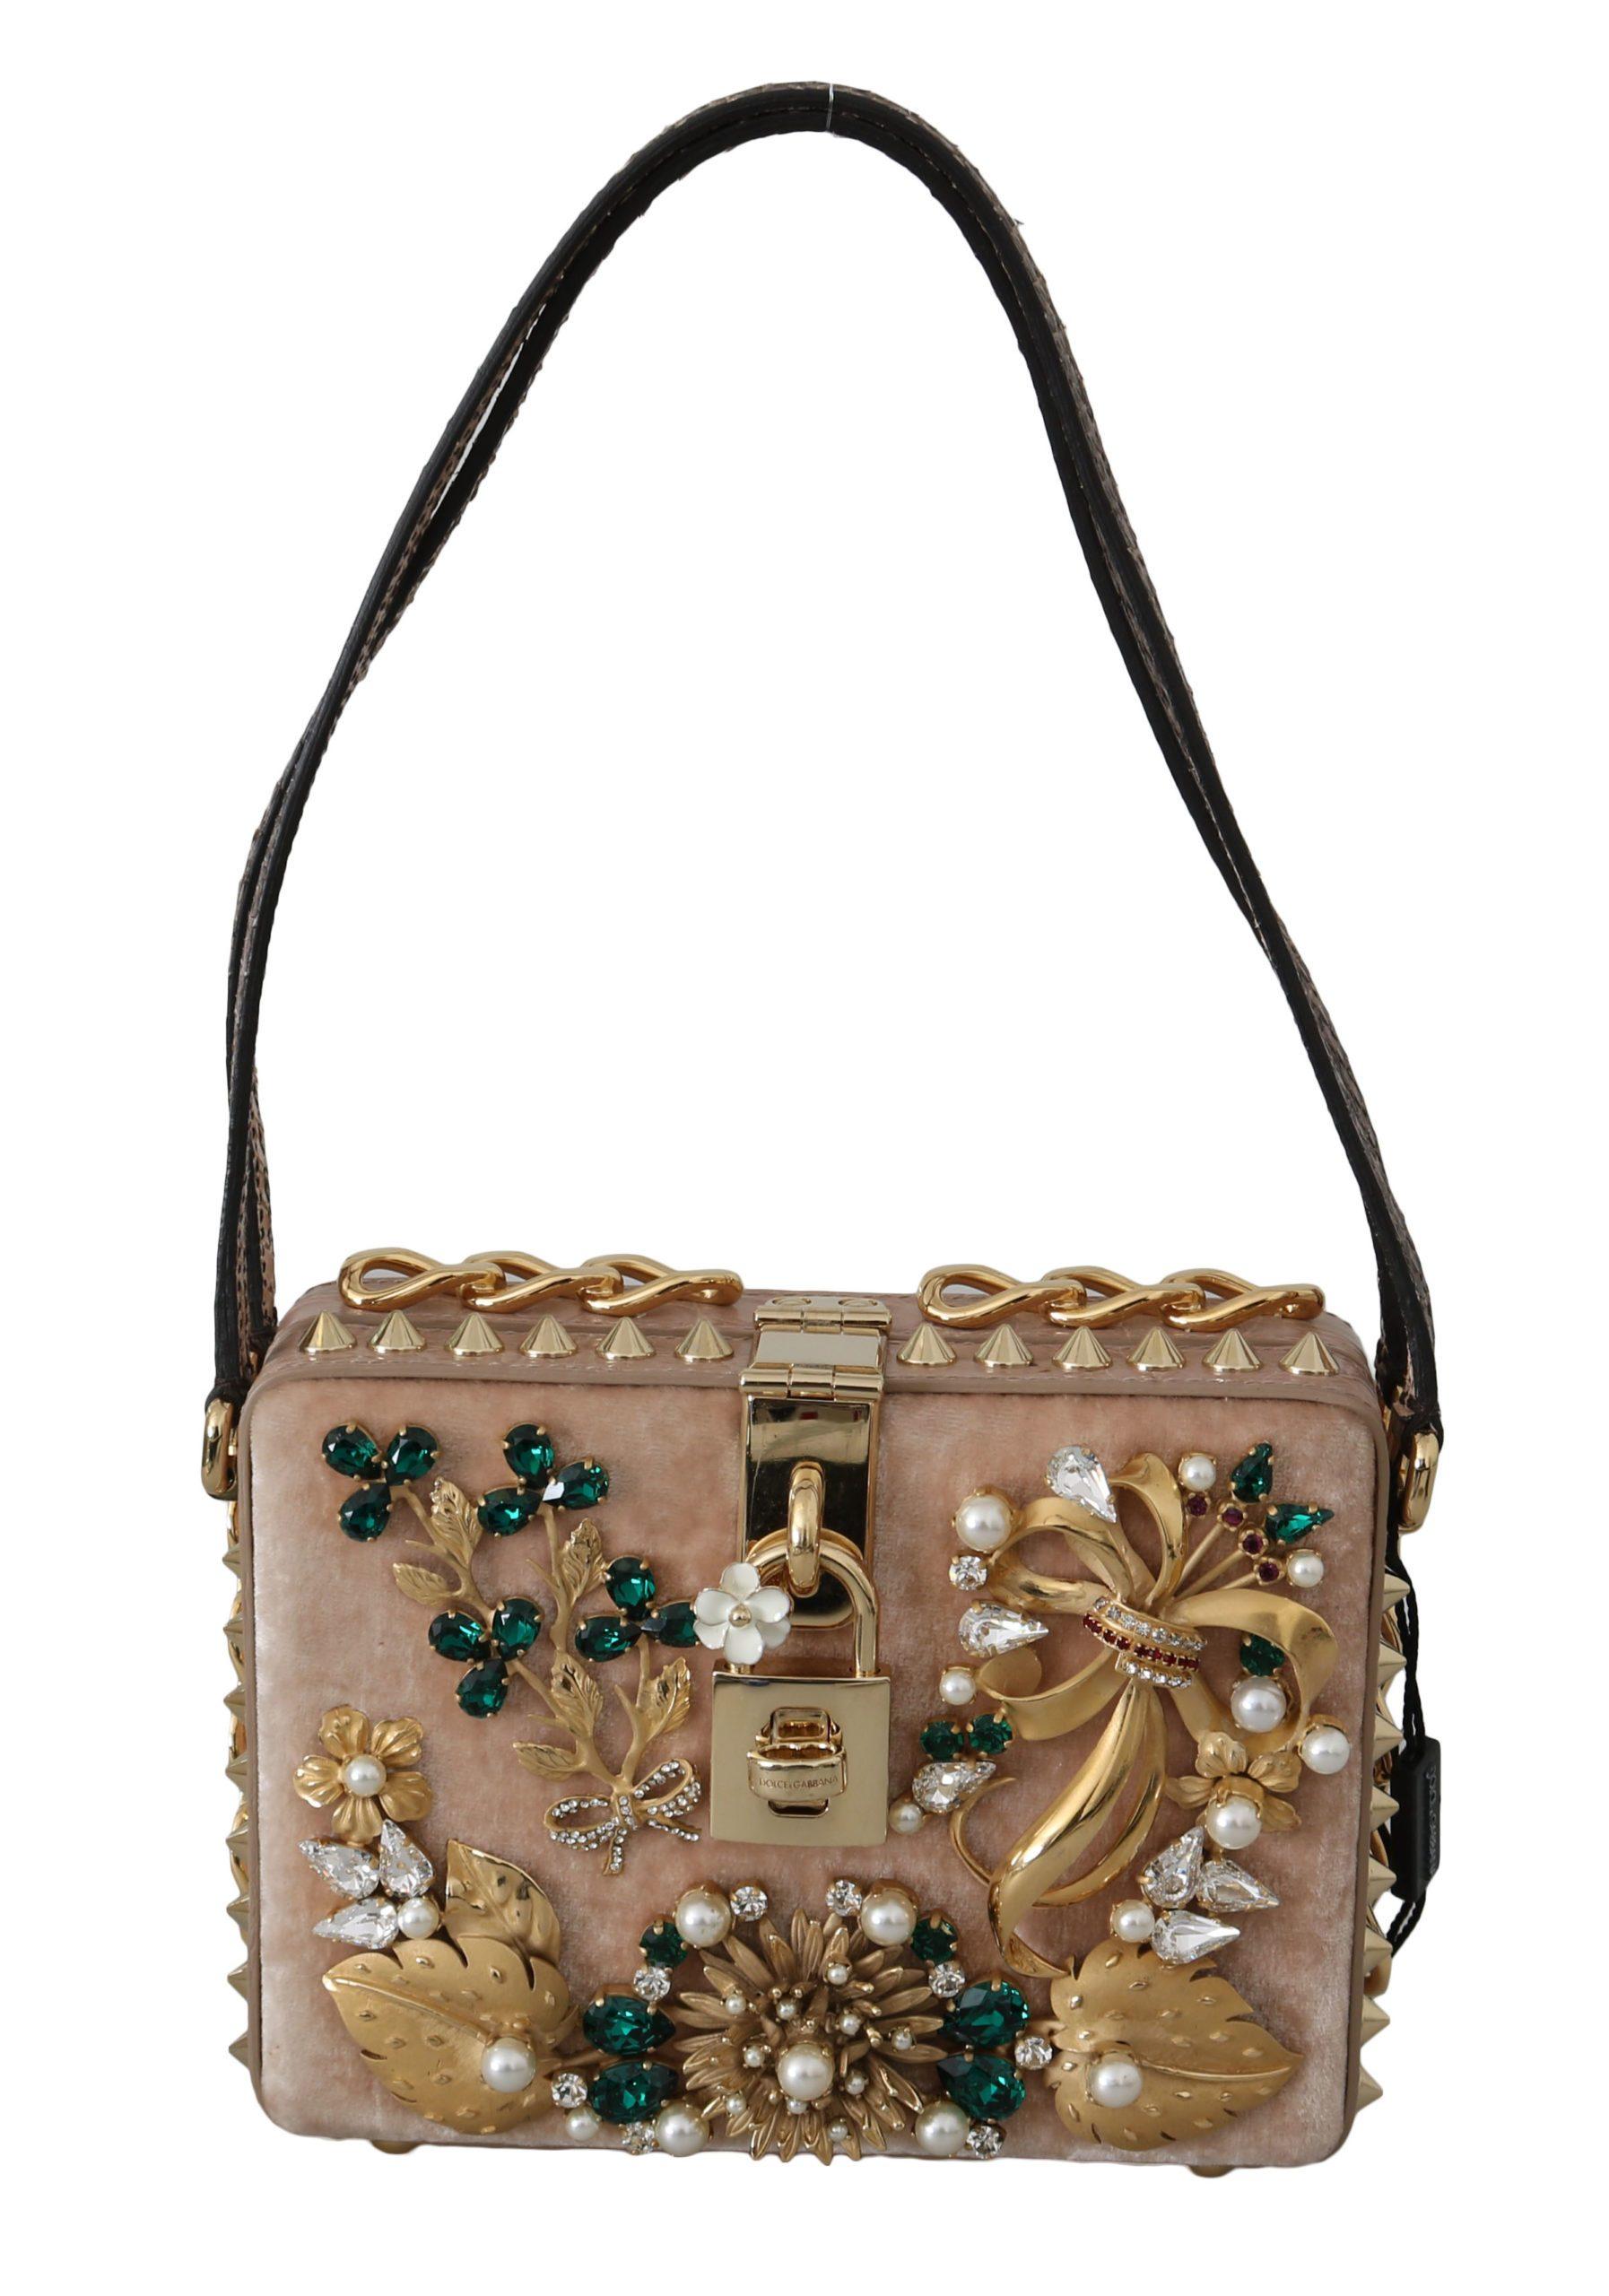 Dolce & Gabbana Women's Leather Crystal Clutch Bag Gold VAS8673